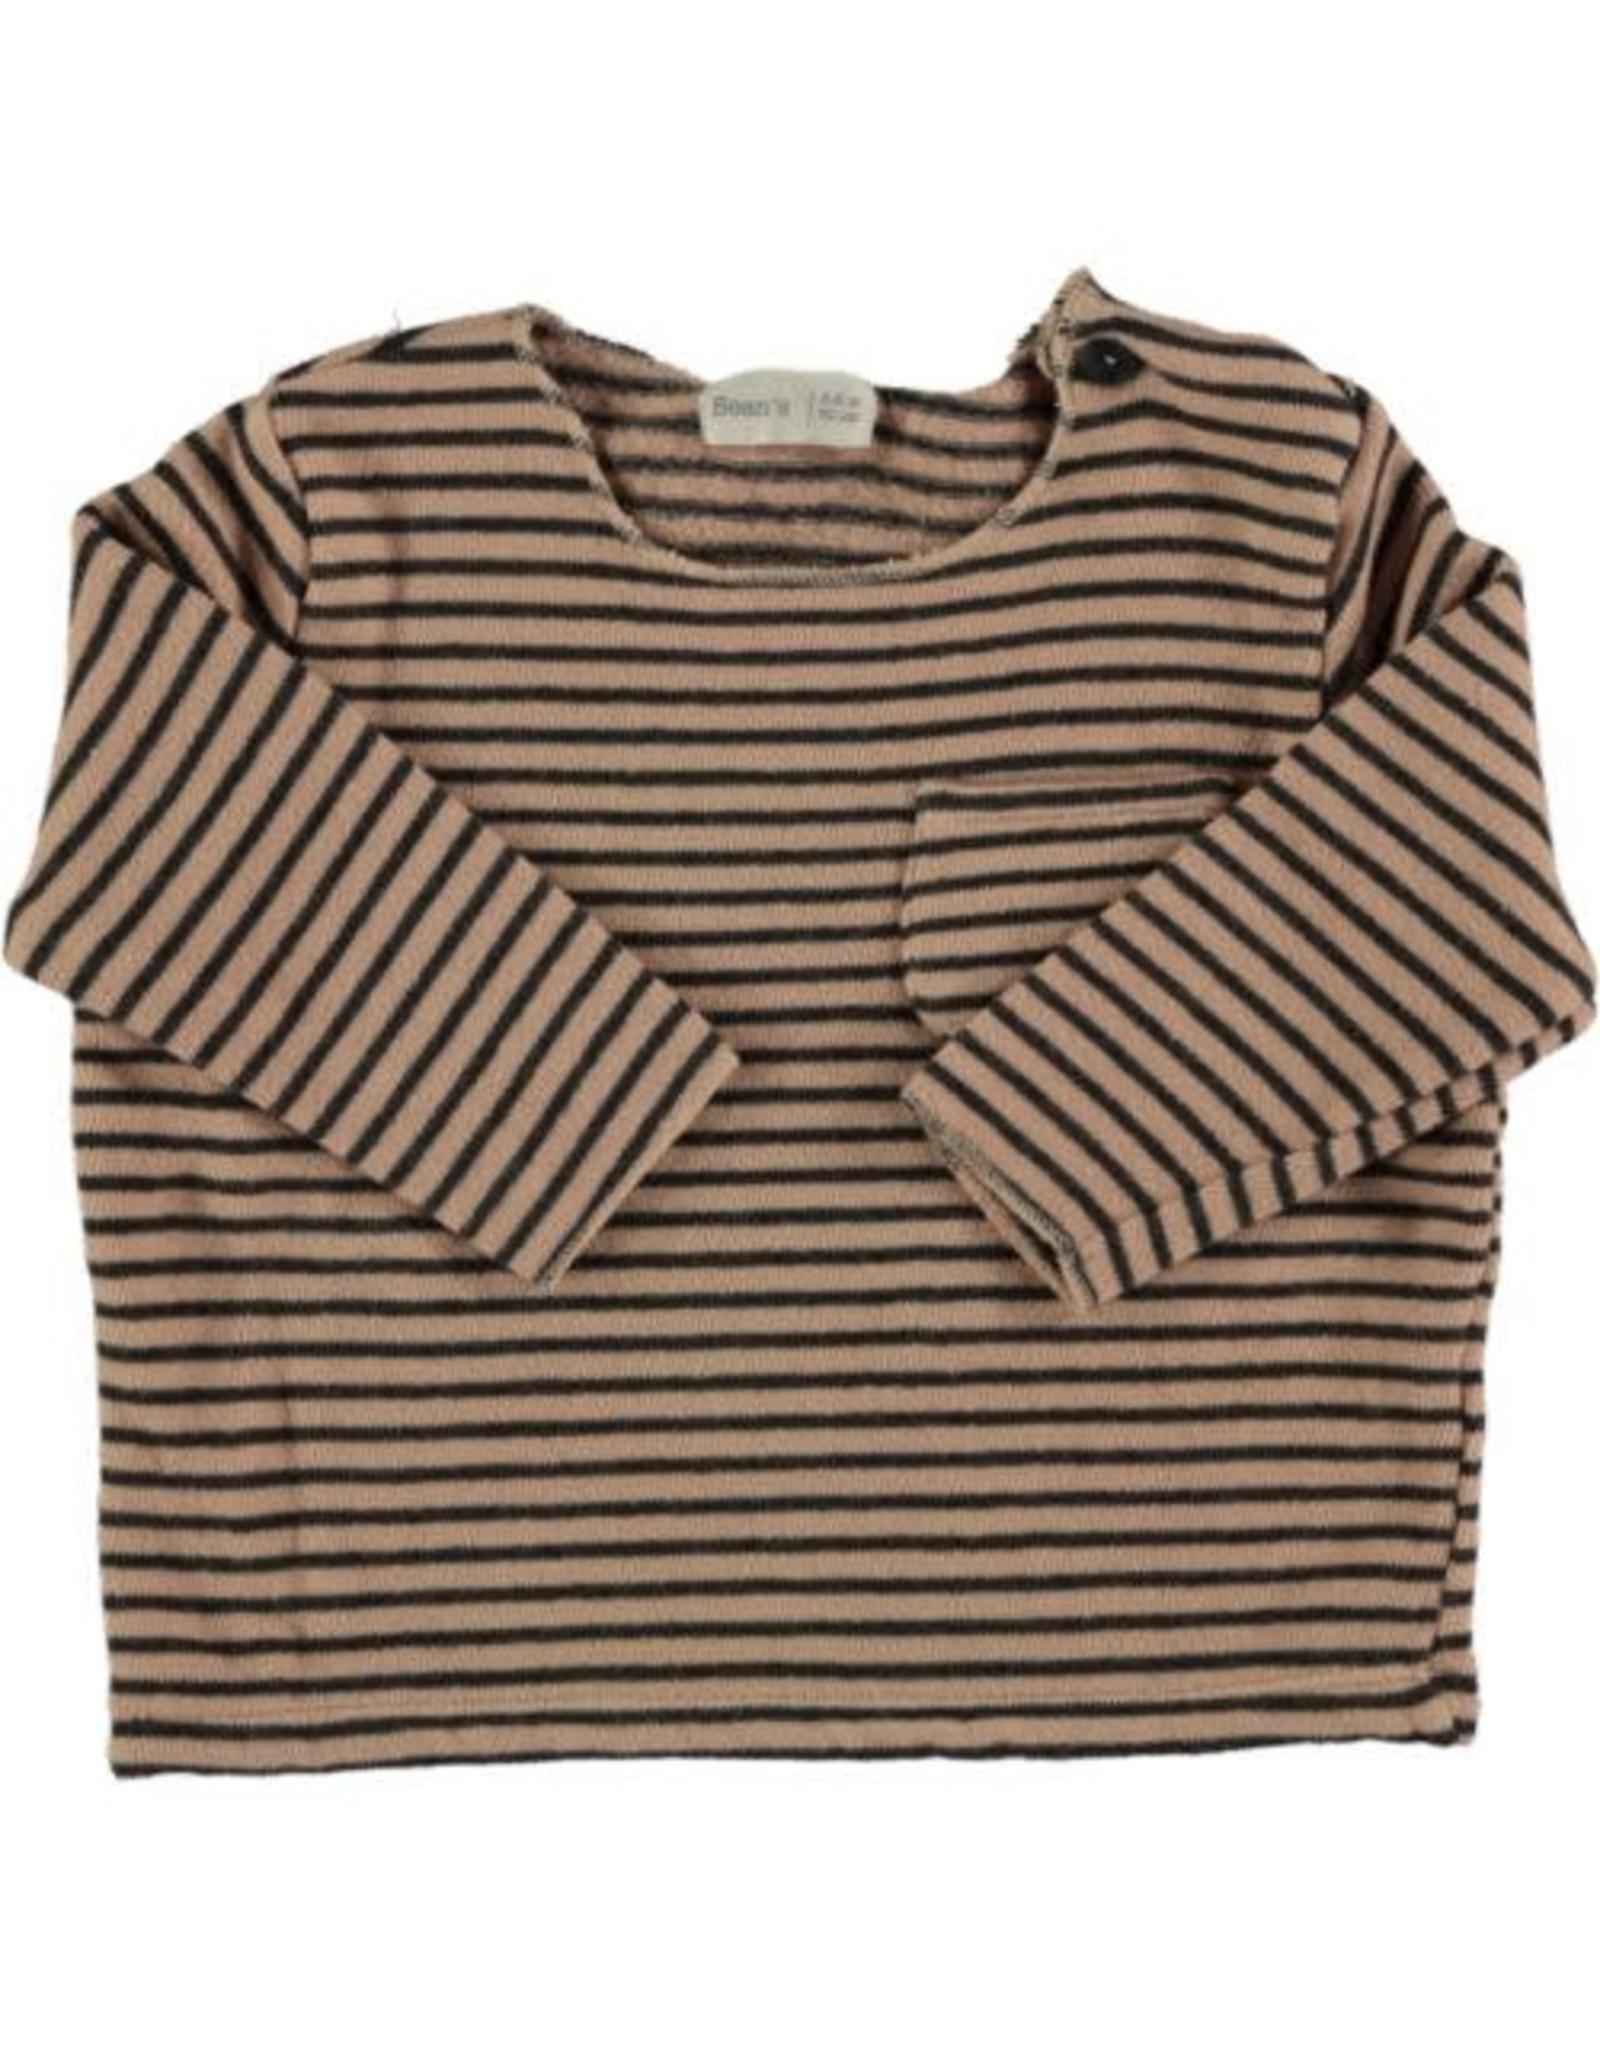 Beans Barcelona Beans Barcelona Sweater Striped Warm Fleece Nude